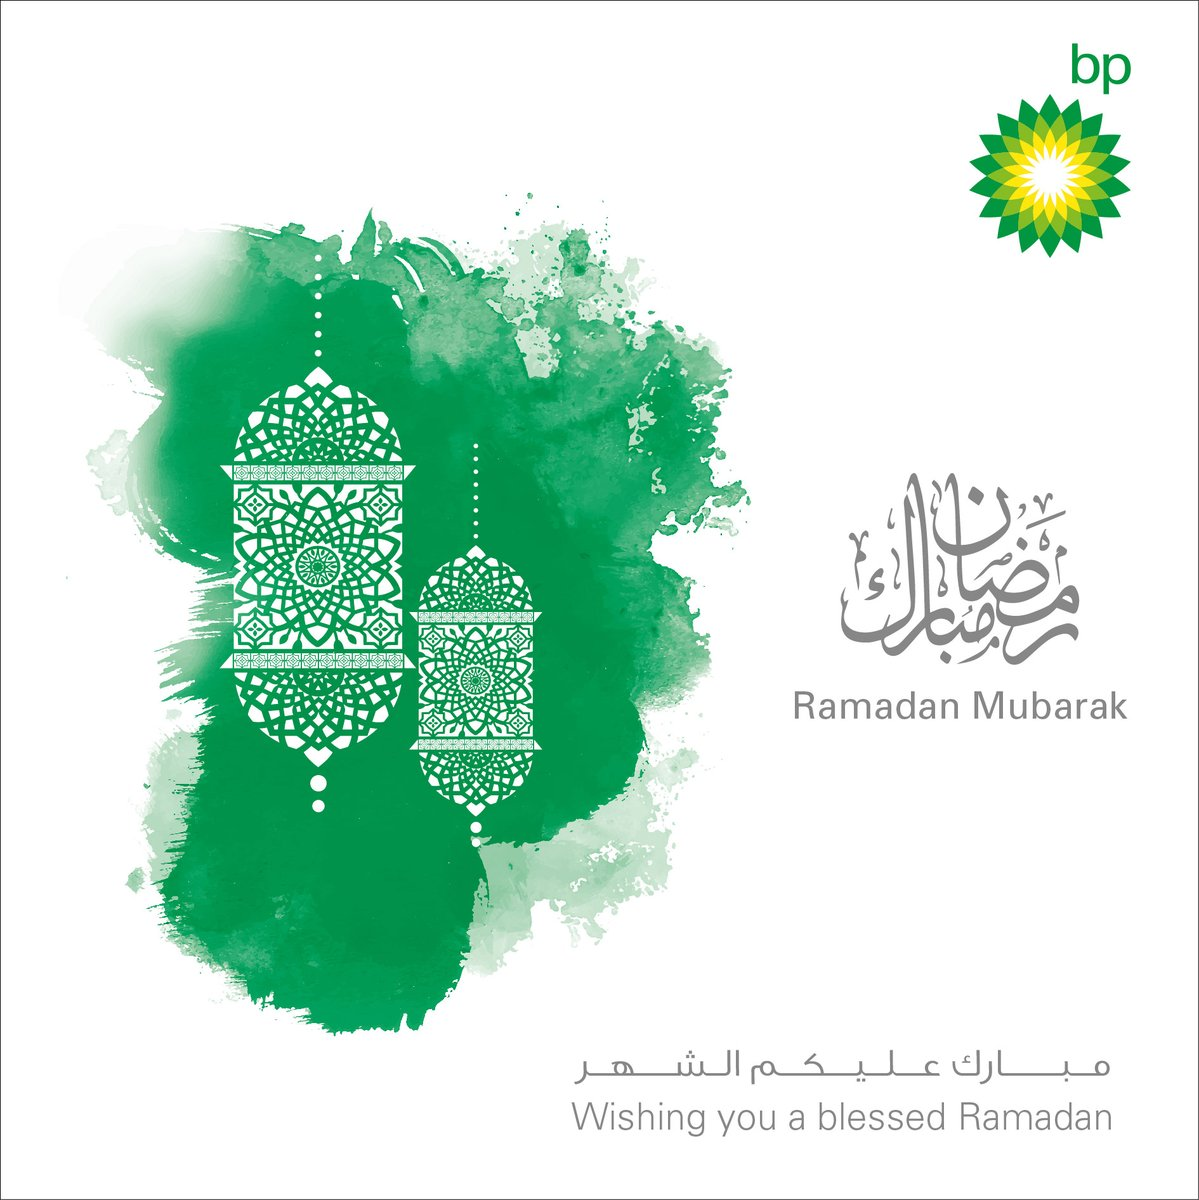 #BP wishes all its Muslim followers a Ramadan Mubarak شركة بي. بي. تتمنى لجميع المسلمين صوماً مقبولاً، وإفطاراً شهياً https://t.co/oFnGwuzYsr